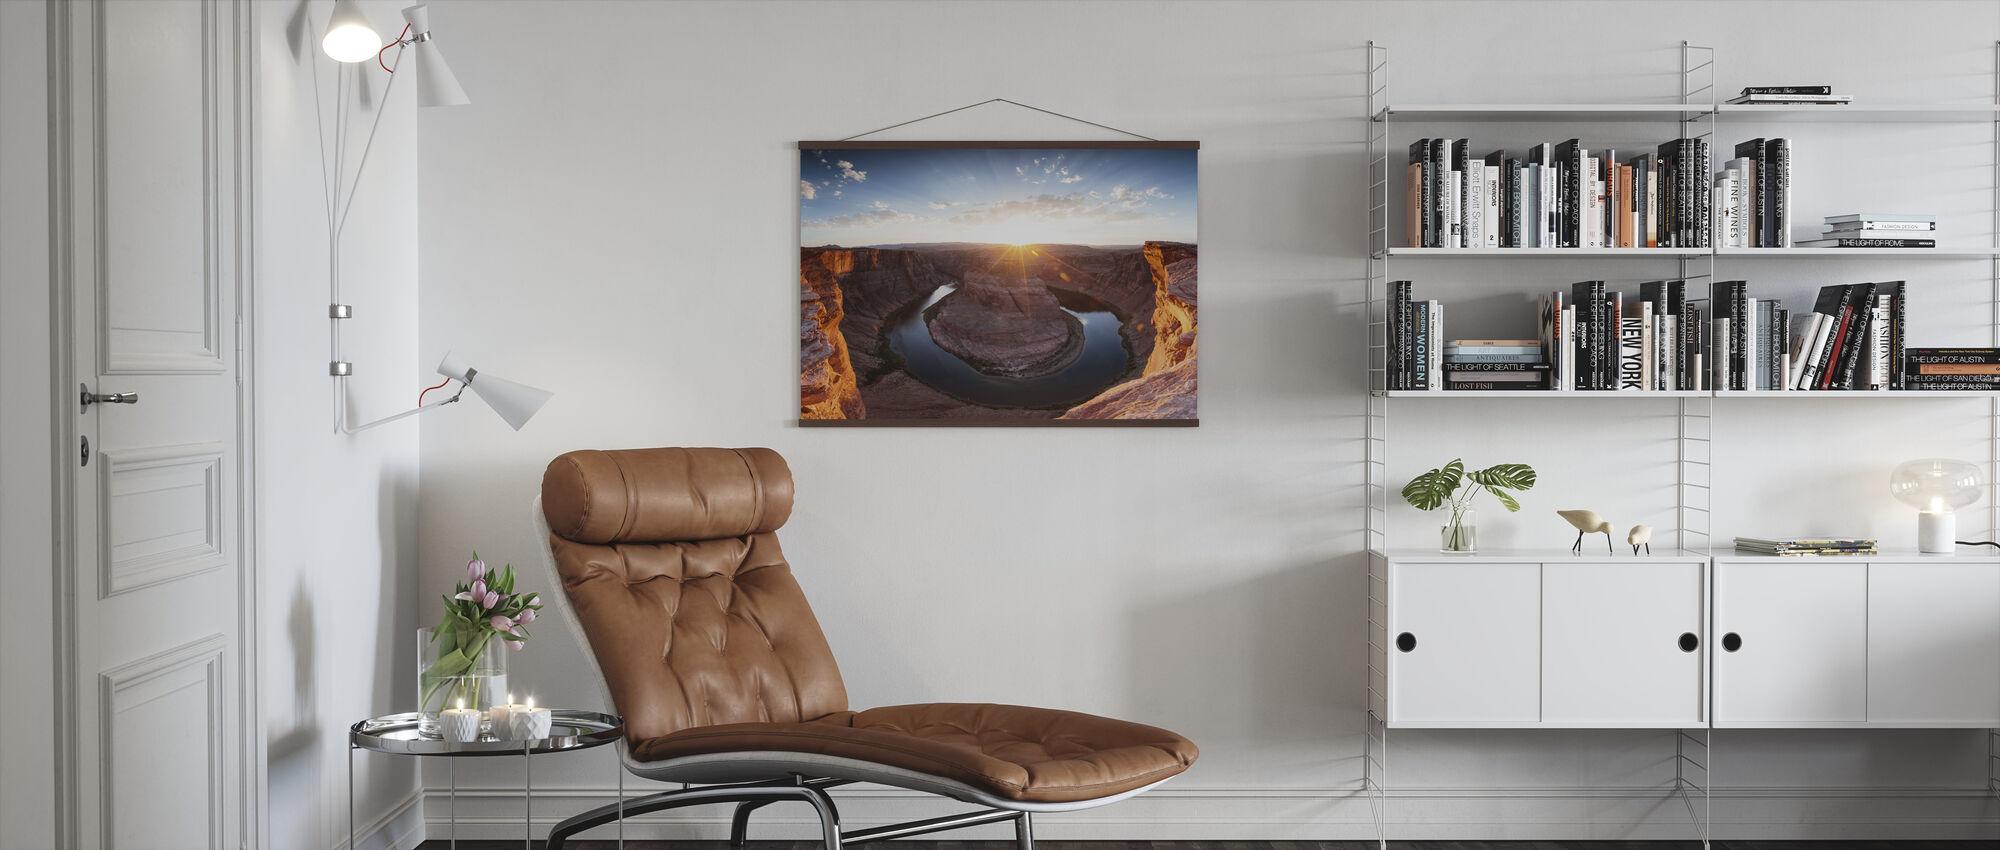 Hästsko Böj - Poster - Vardagsrum